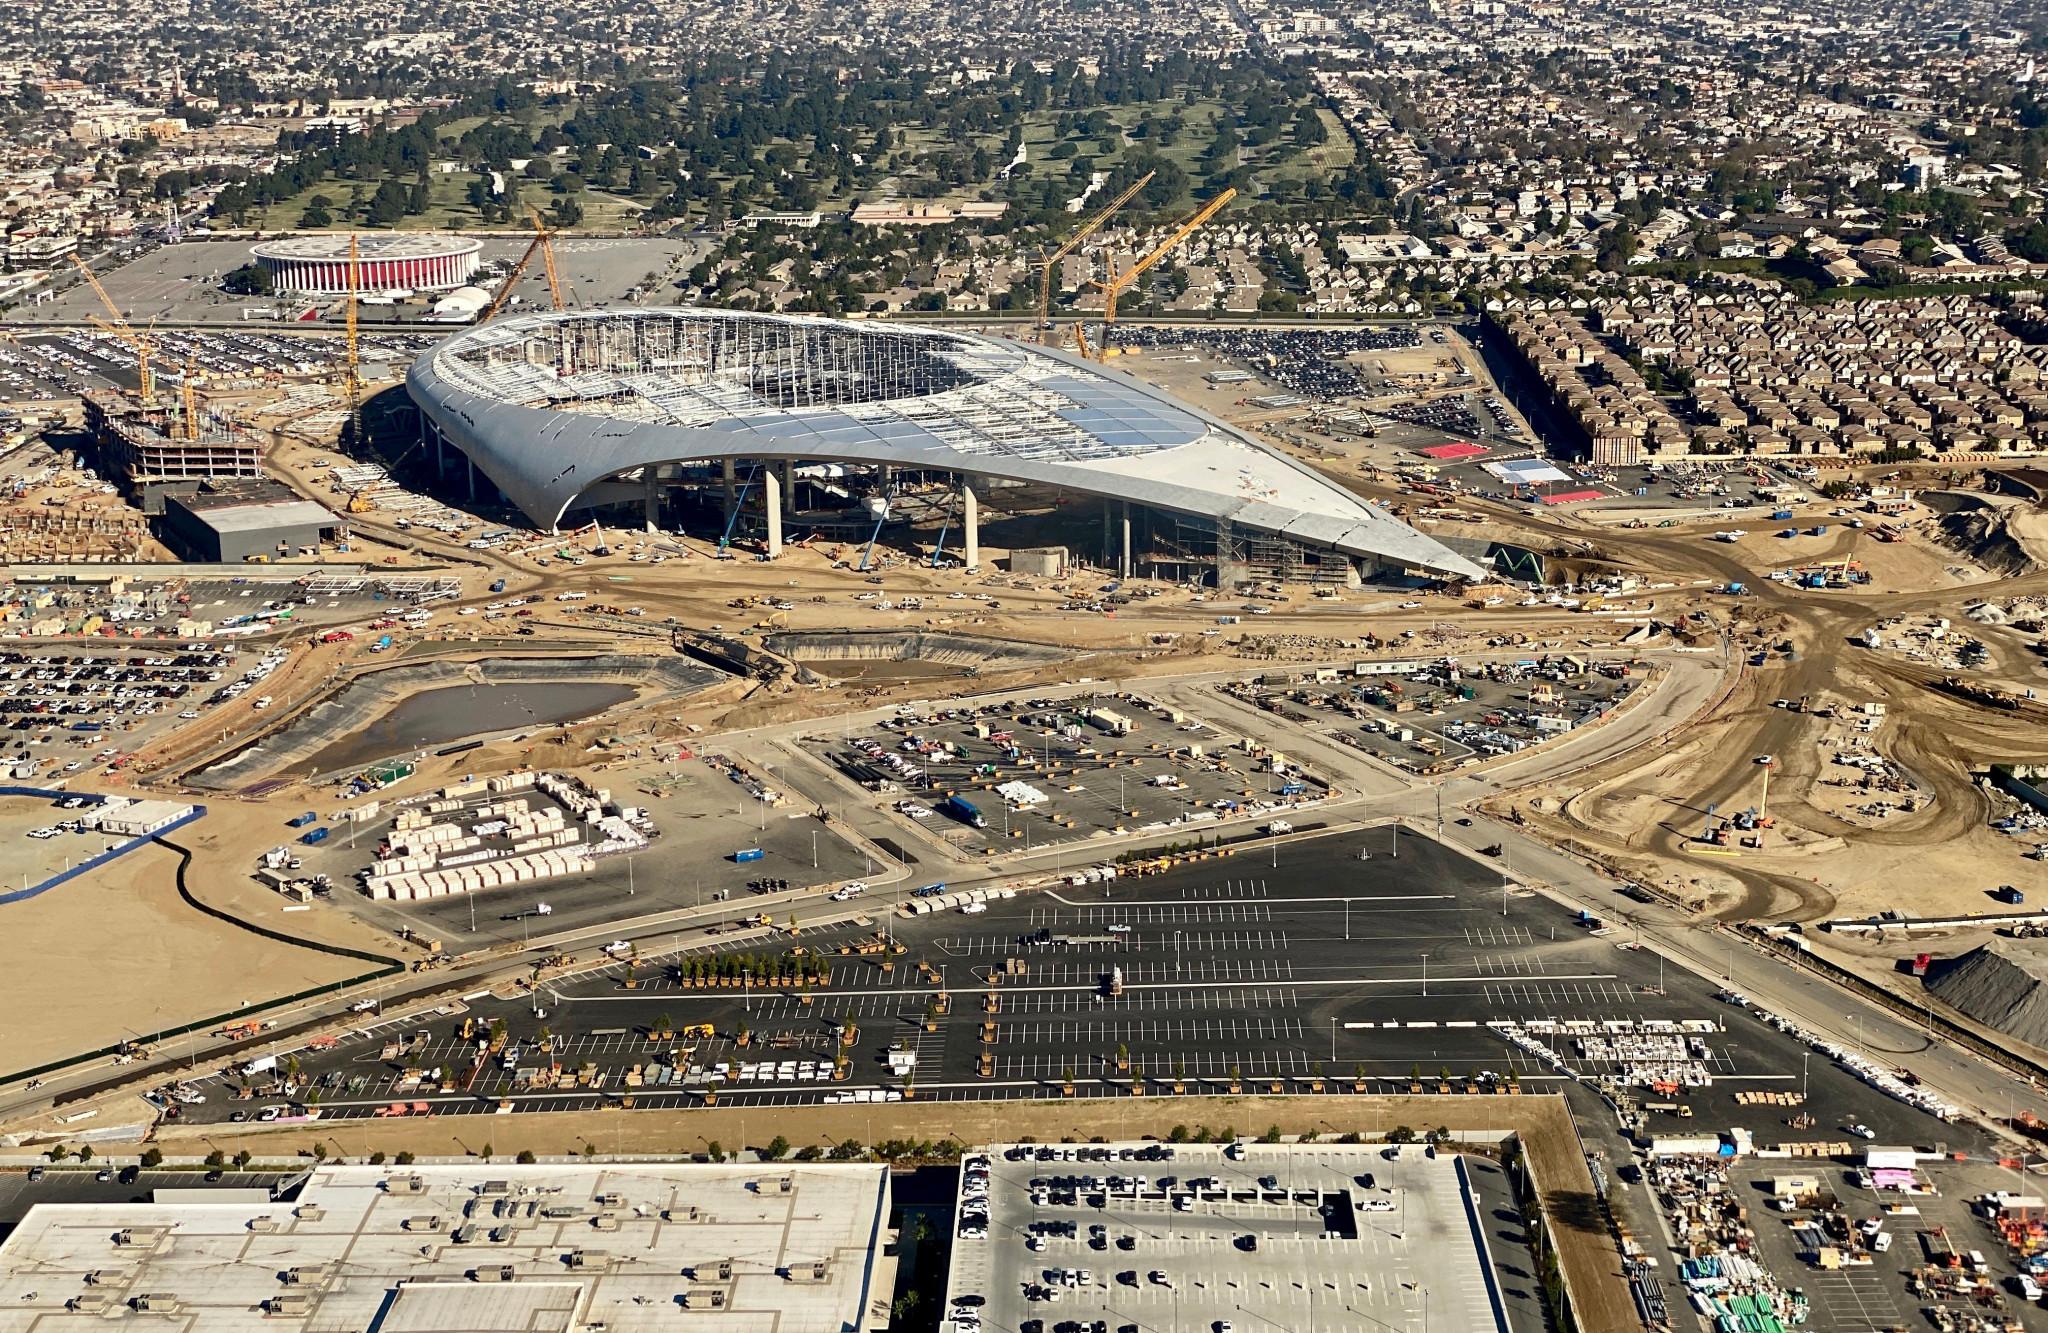 Rams to borrow extra $500 million from NFL to fund Olympic venue SoFi Stadium